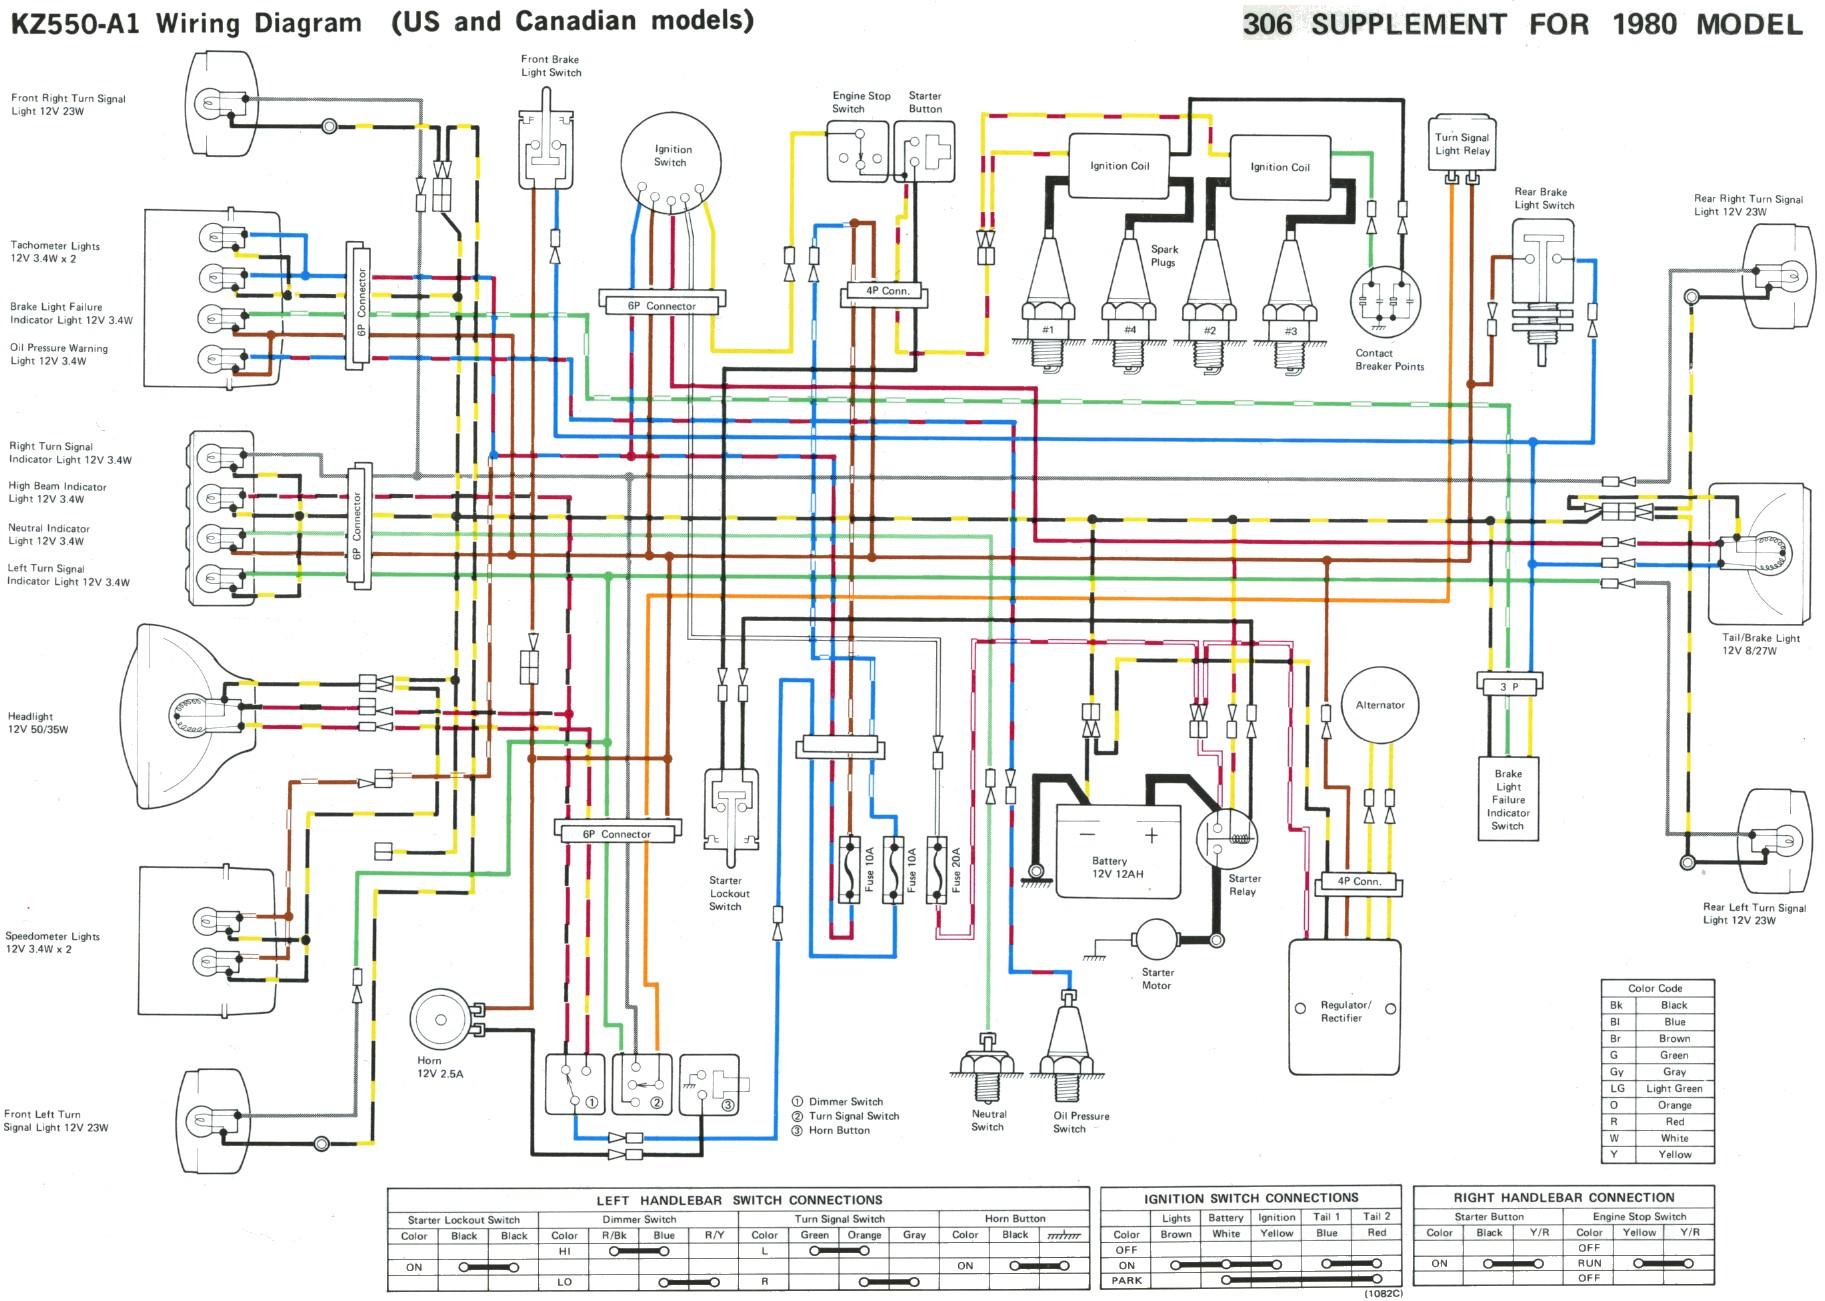 kawasaki wiring schematics kawasaki f9 wiring diagram rain repeat14 klictravel nl  kawasaki f9 wiring diagram rain